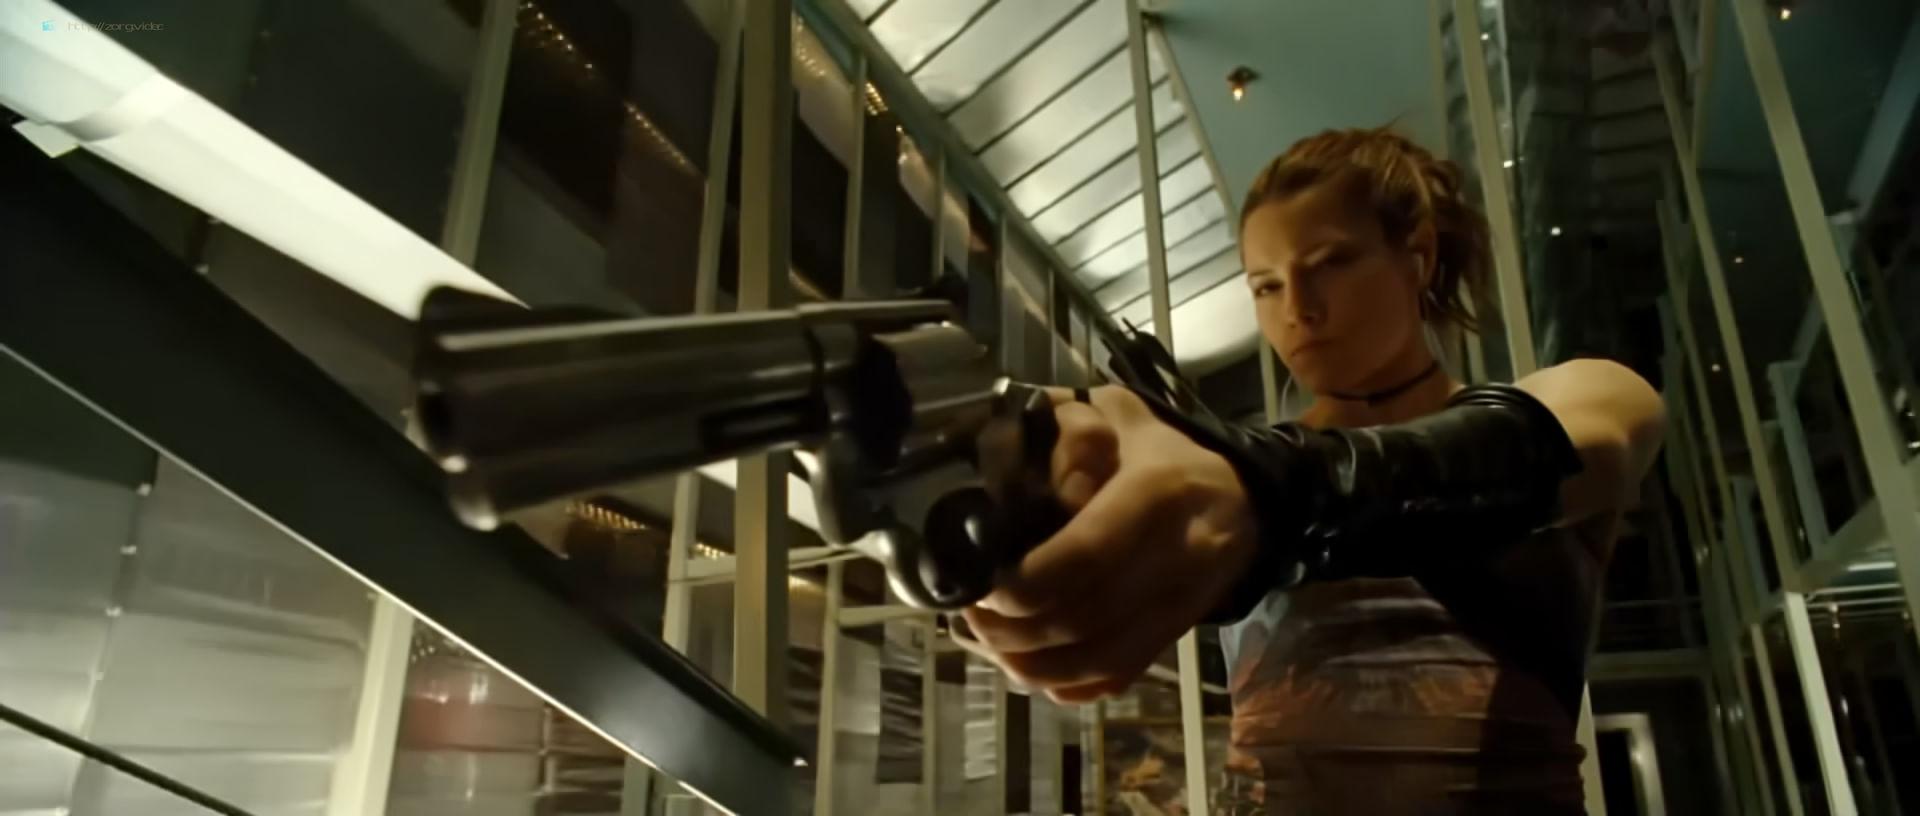 Jessica Biel hot and sexy - Blade Trinity (2004) HD 1080p BluRay (2)